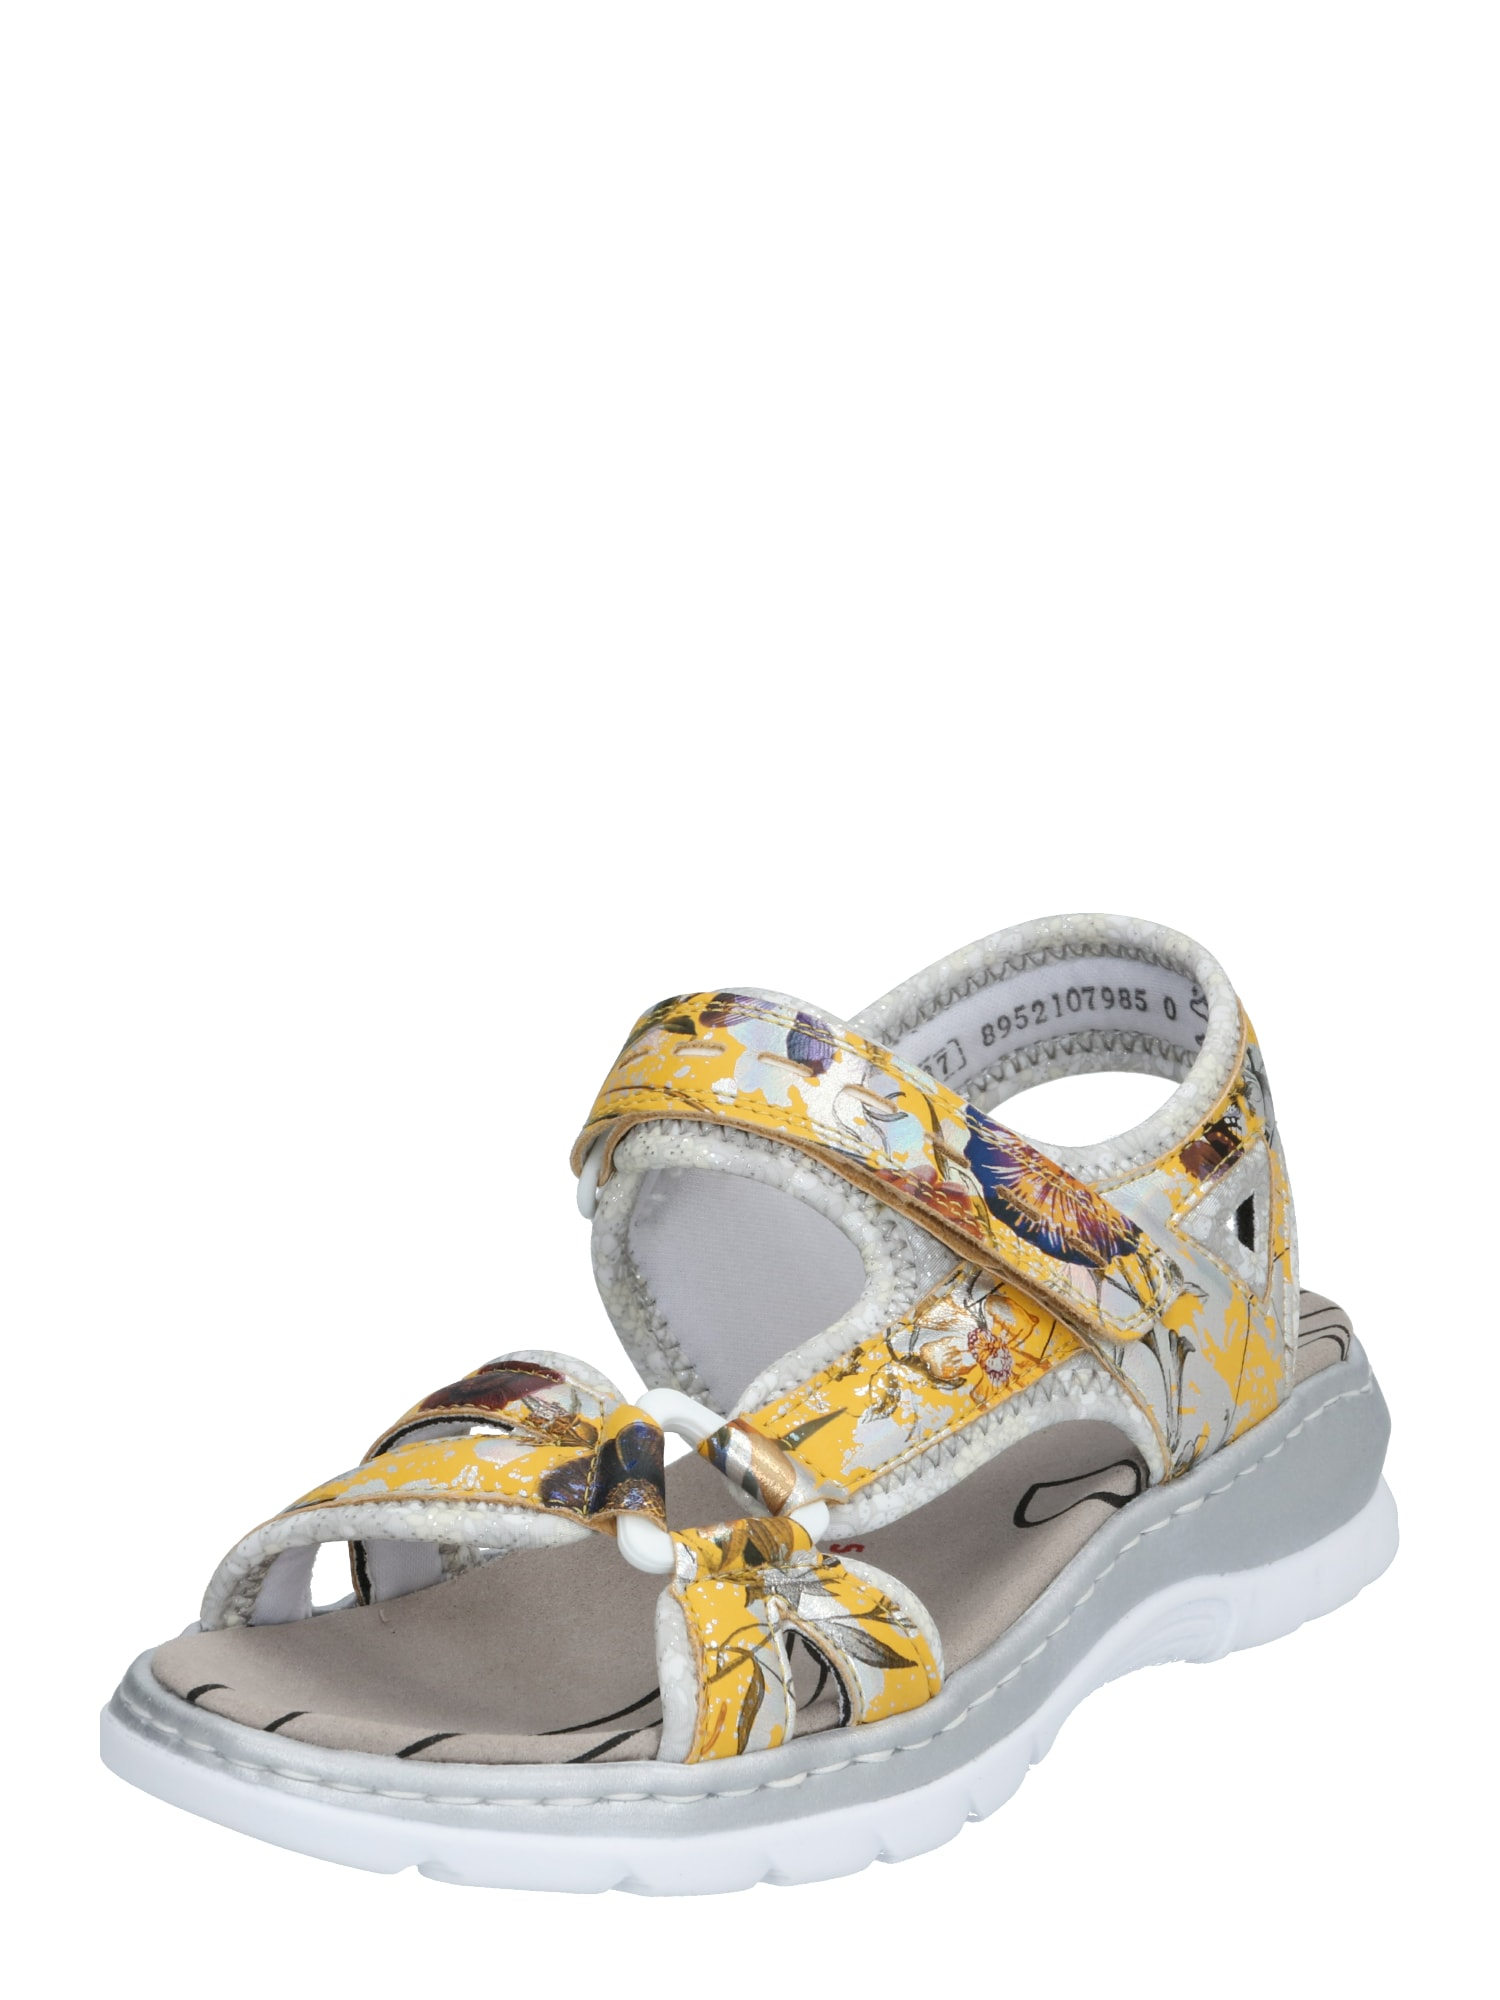 RIEKER Sandalai geltona / mišrios spalvos